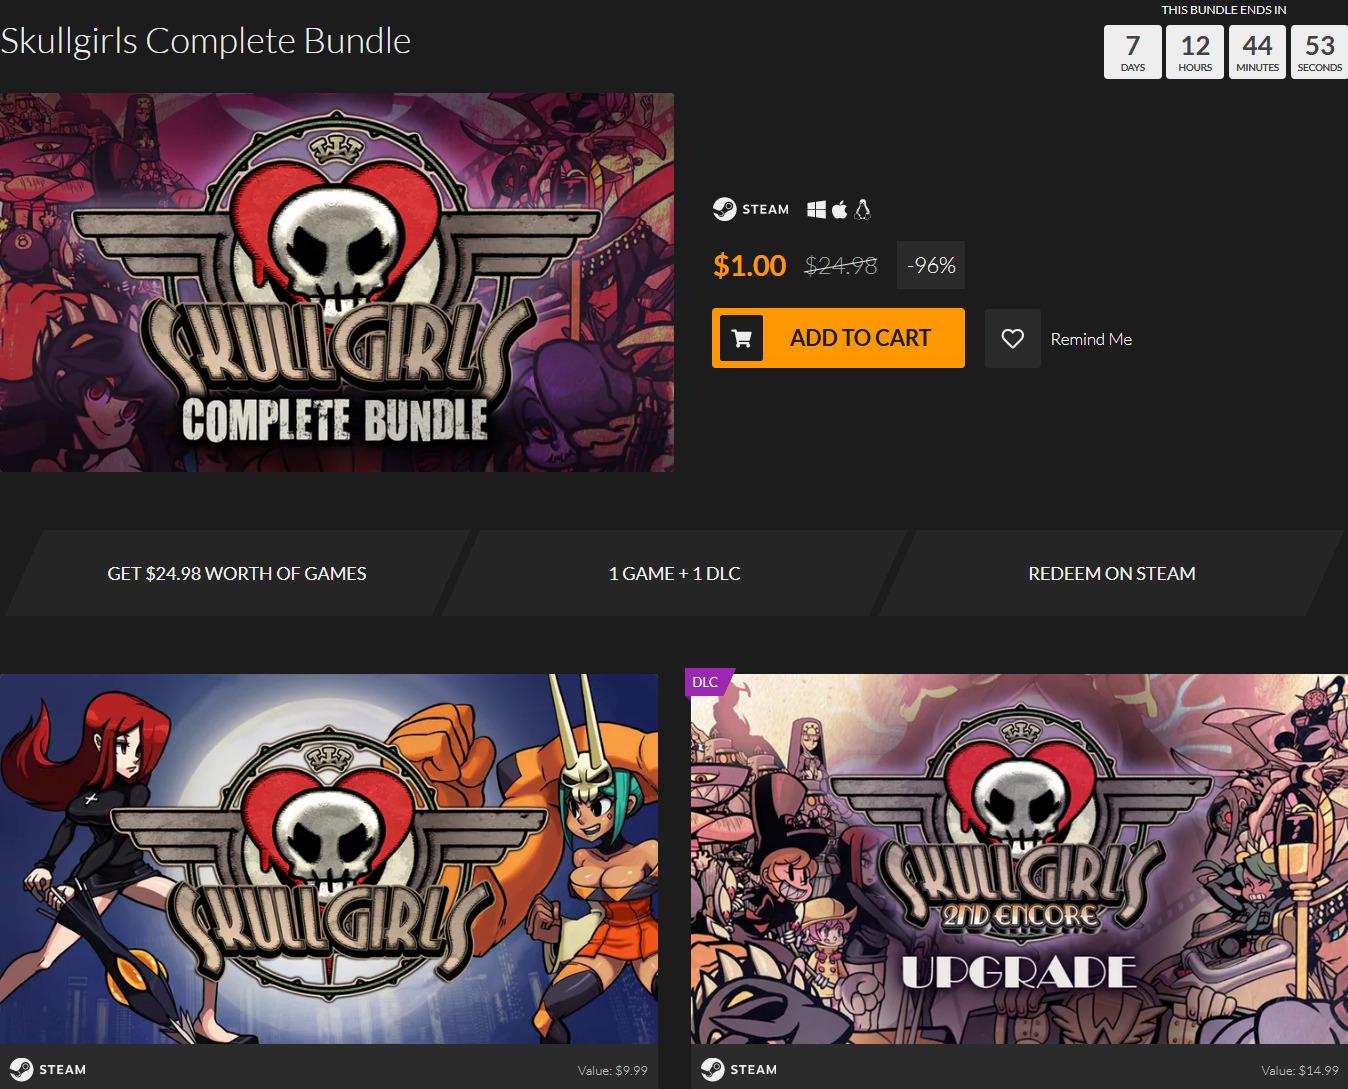 Screenshot_2019-03-28 Skullgirls Complete Bundle Steam Game Bundle Fanatical.jpg